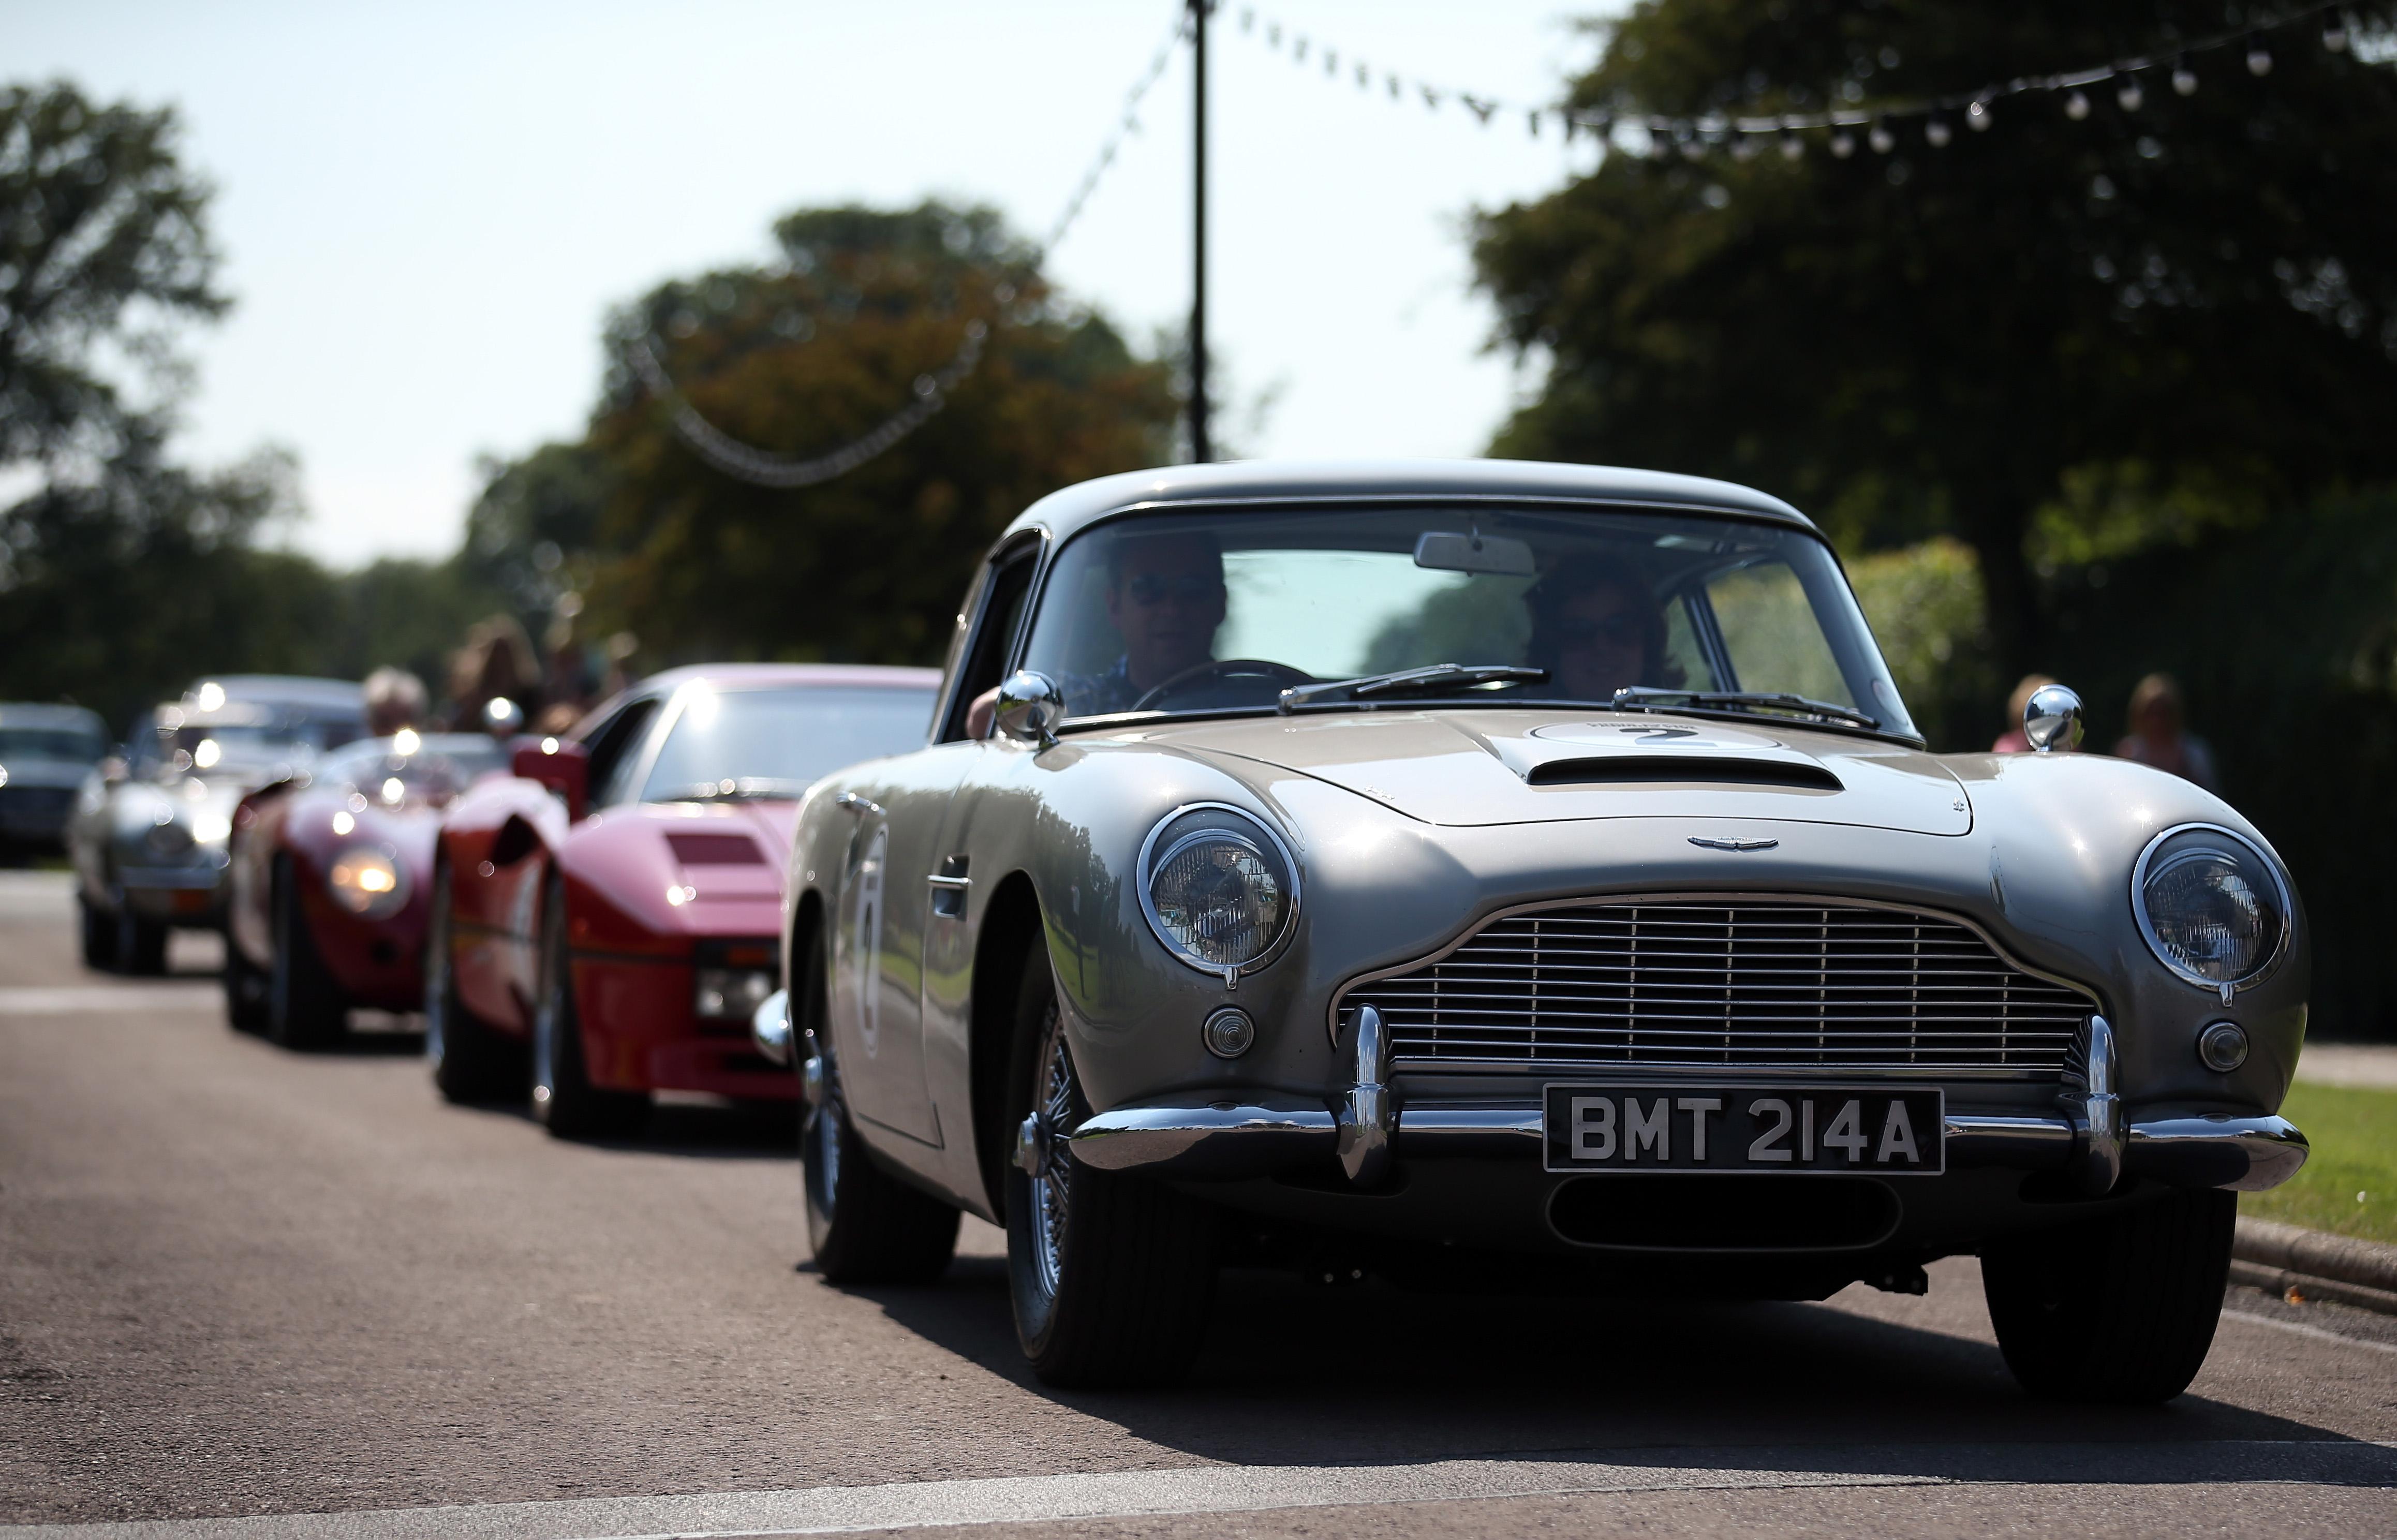 Aston Martin faces calls for board shake-up